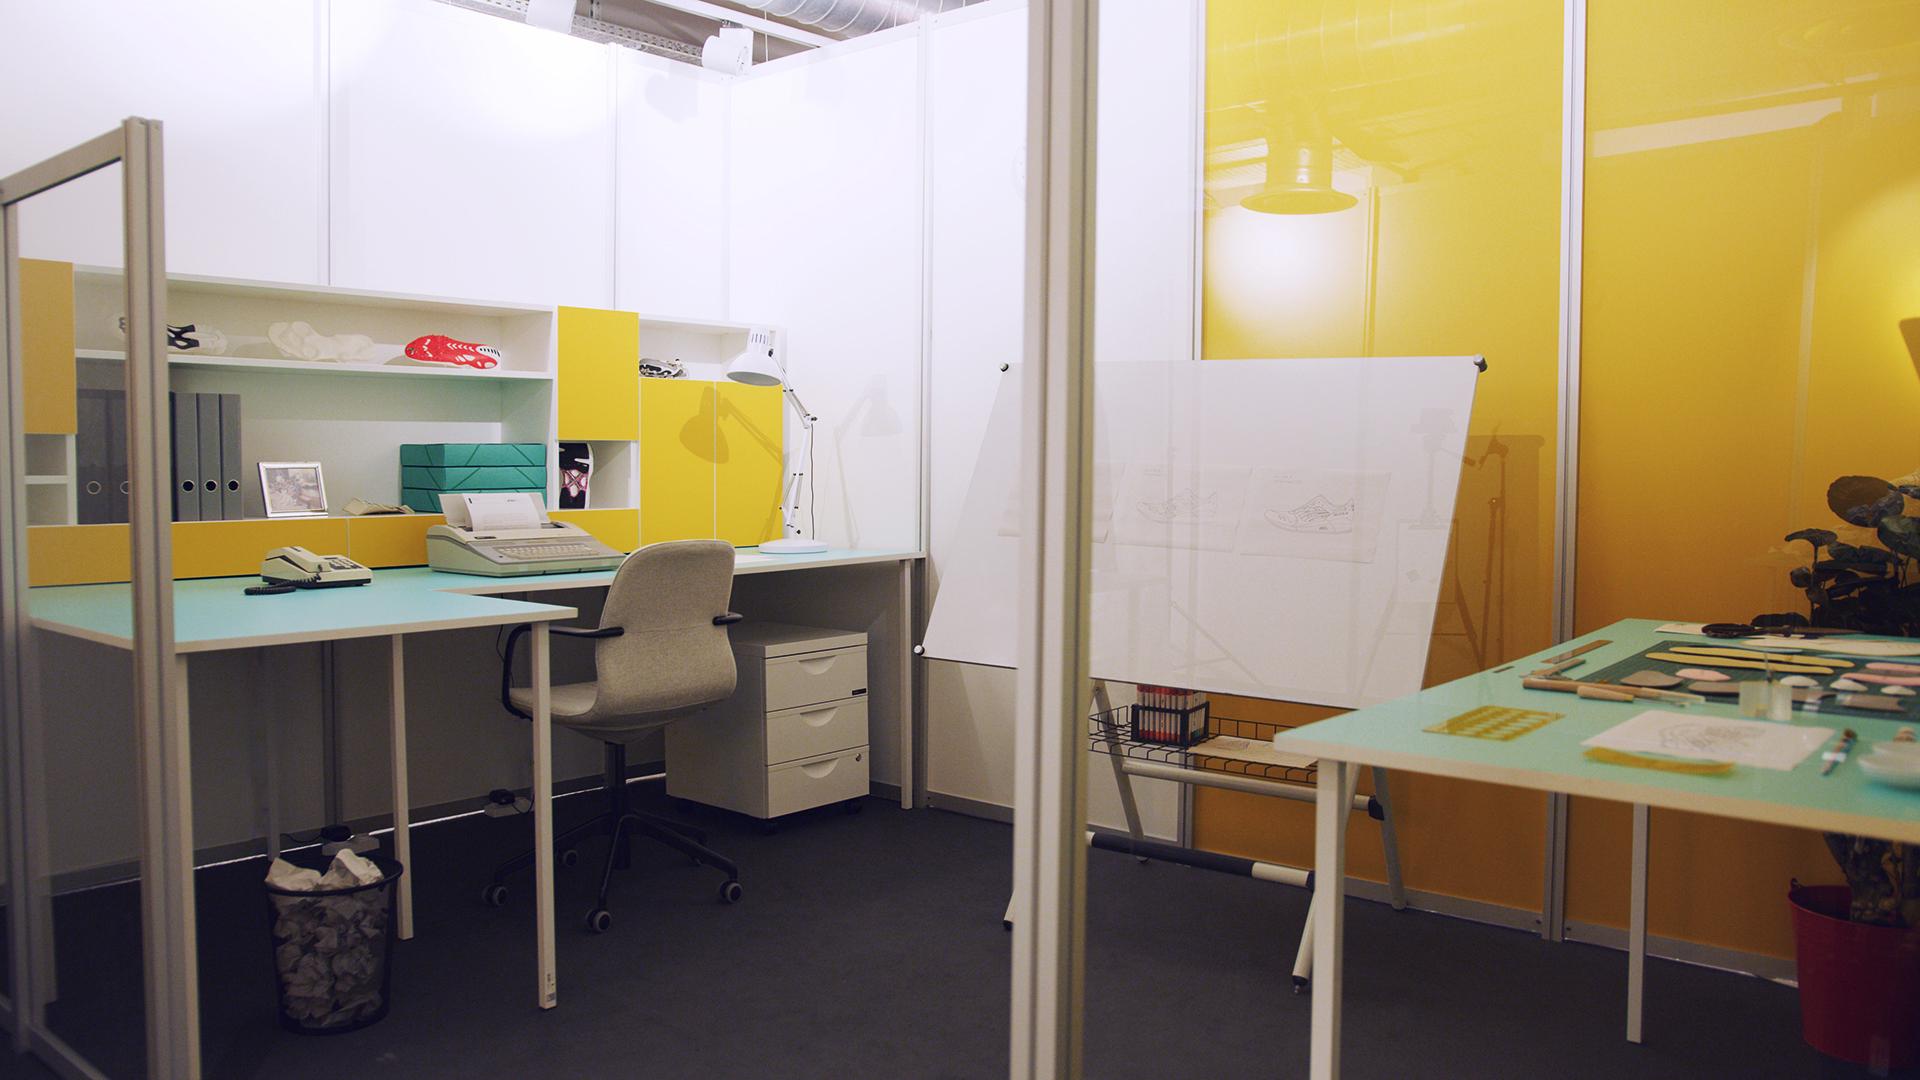 ASICS-GEL-LYTE-III-30-Year-Celebration-22Mitsui-Museum22-Paris-Fashion-Week-2019-Office-01